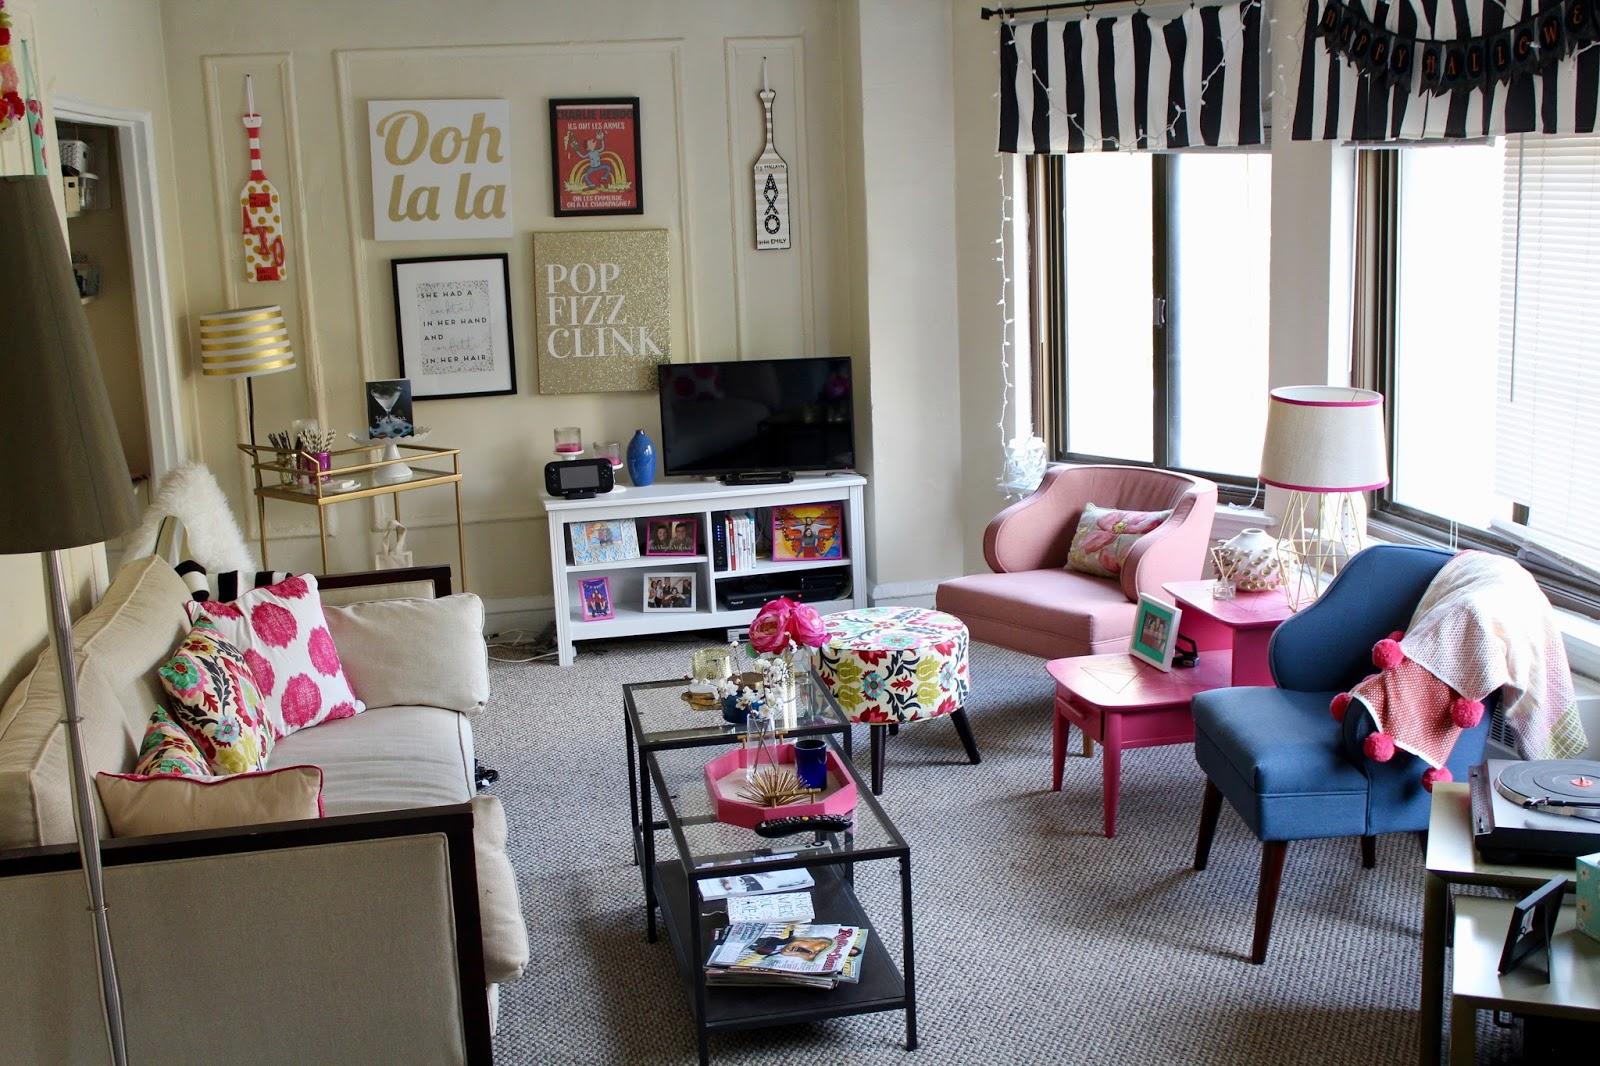 My Apartment Room Tour - Latest BestApartment 2018